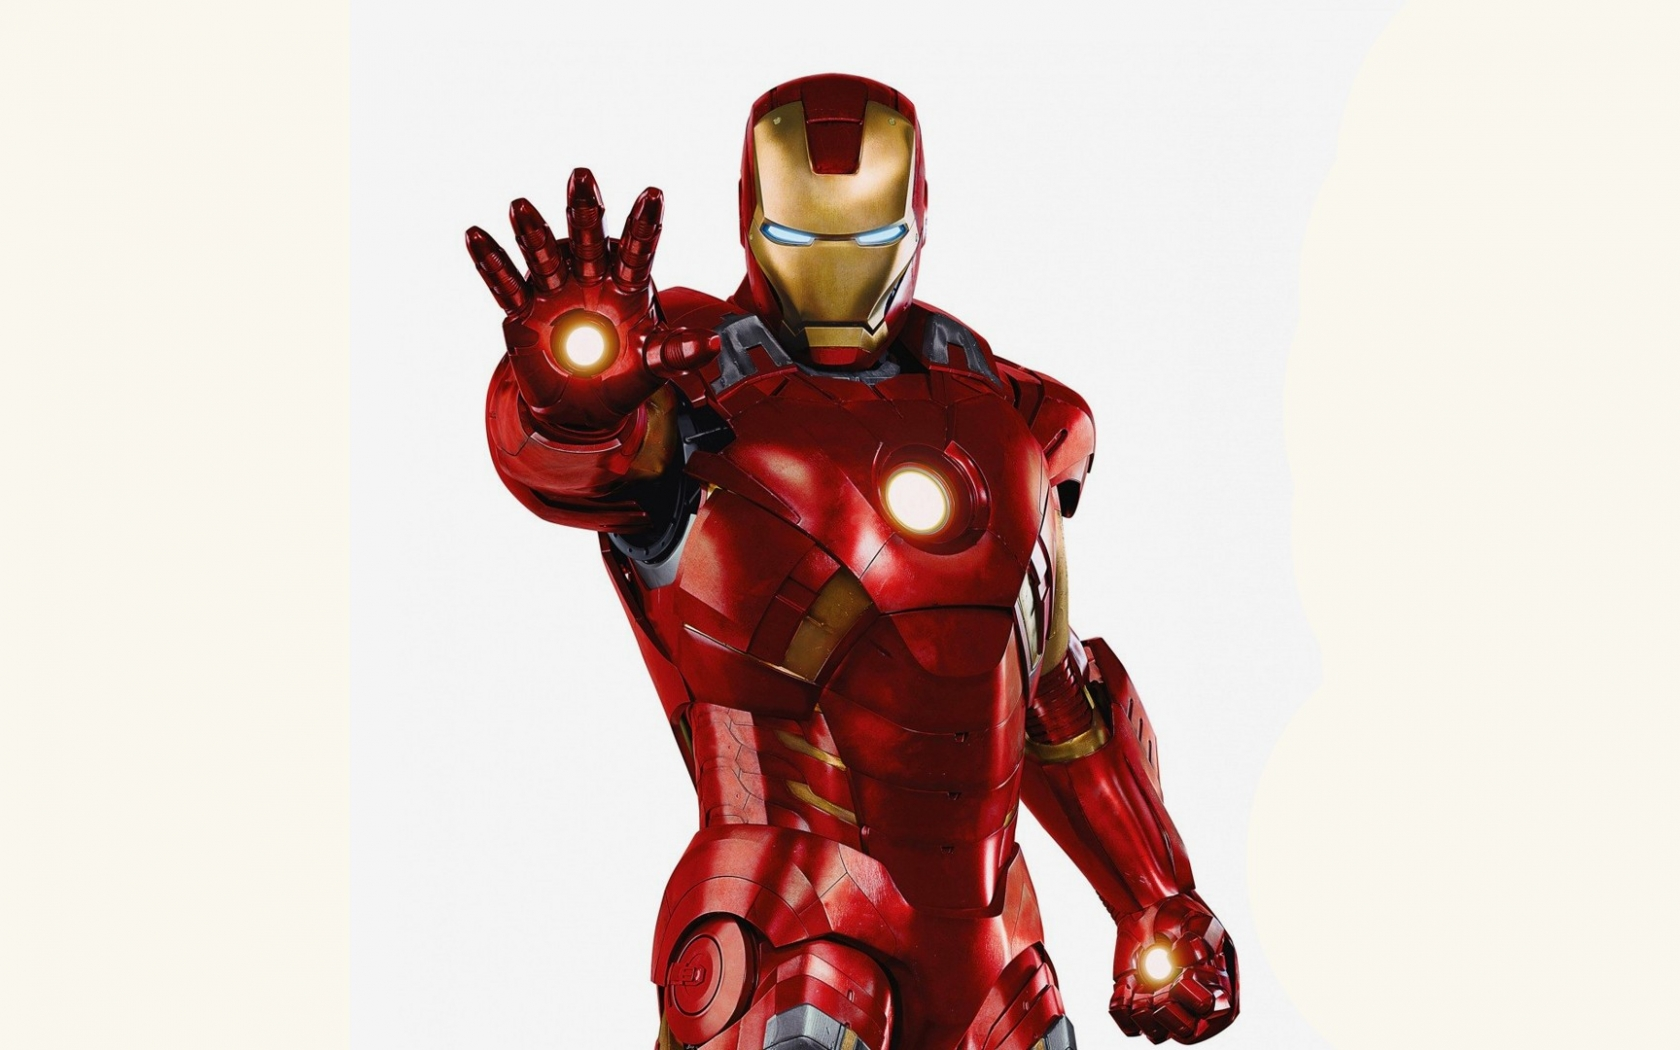 Traje de Iron Man - 1680x1050